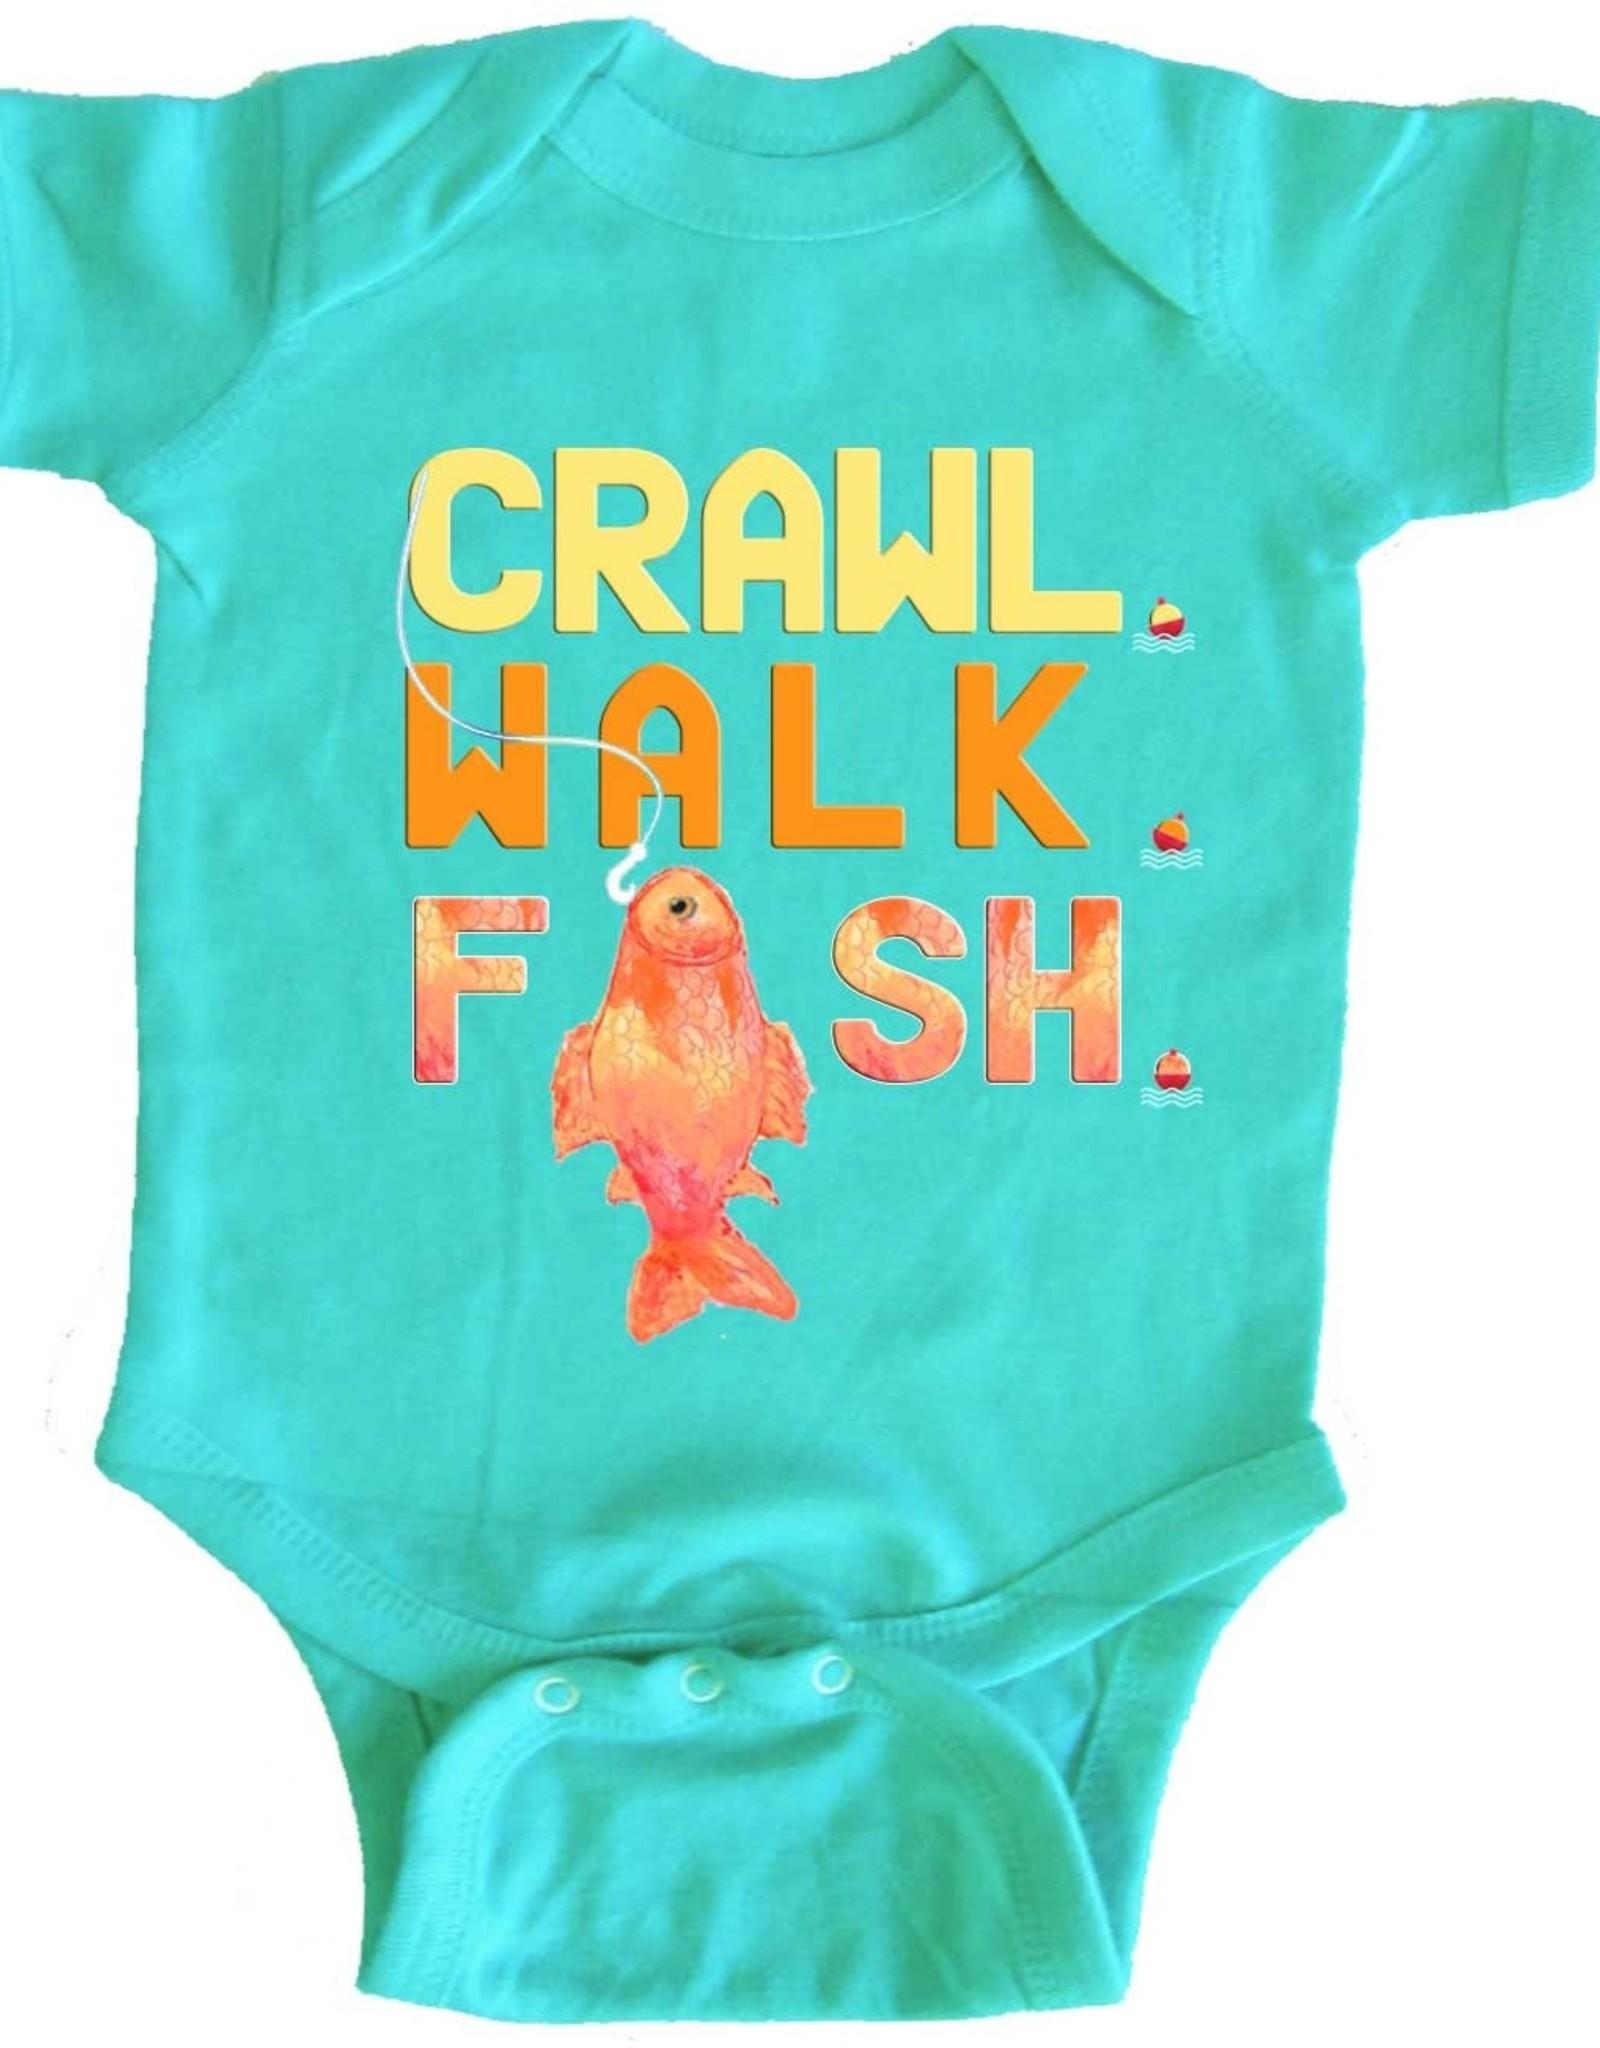 Crawl, Walk, Fish Onesie